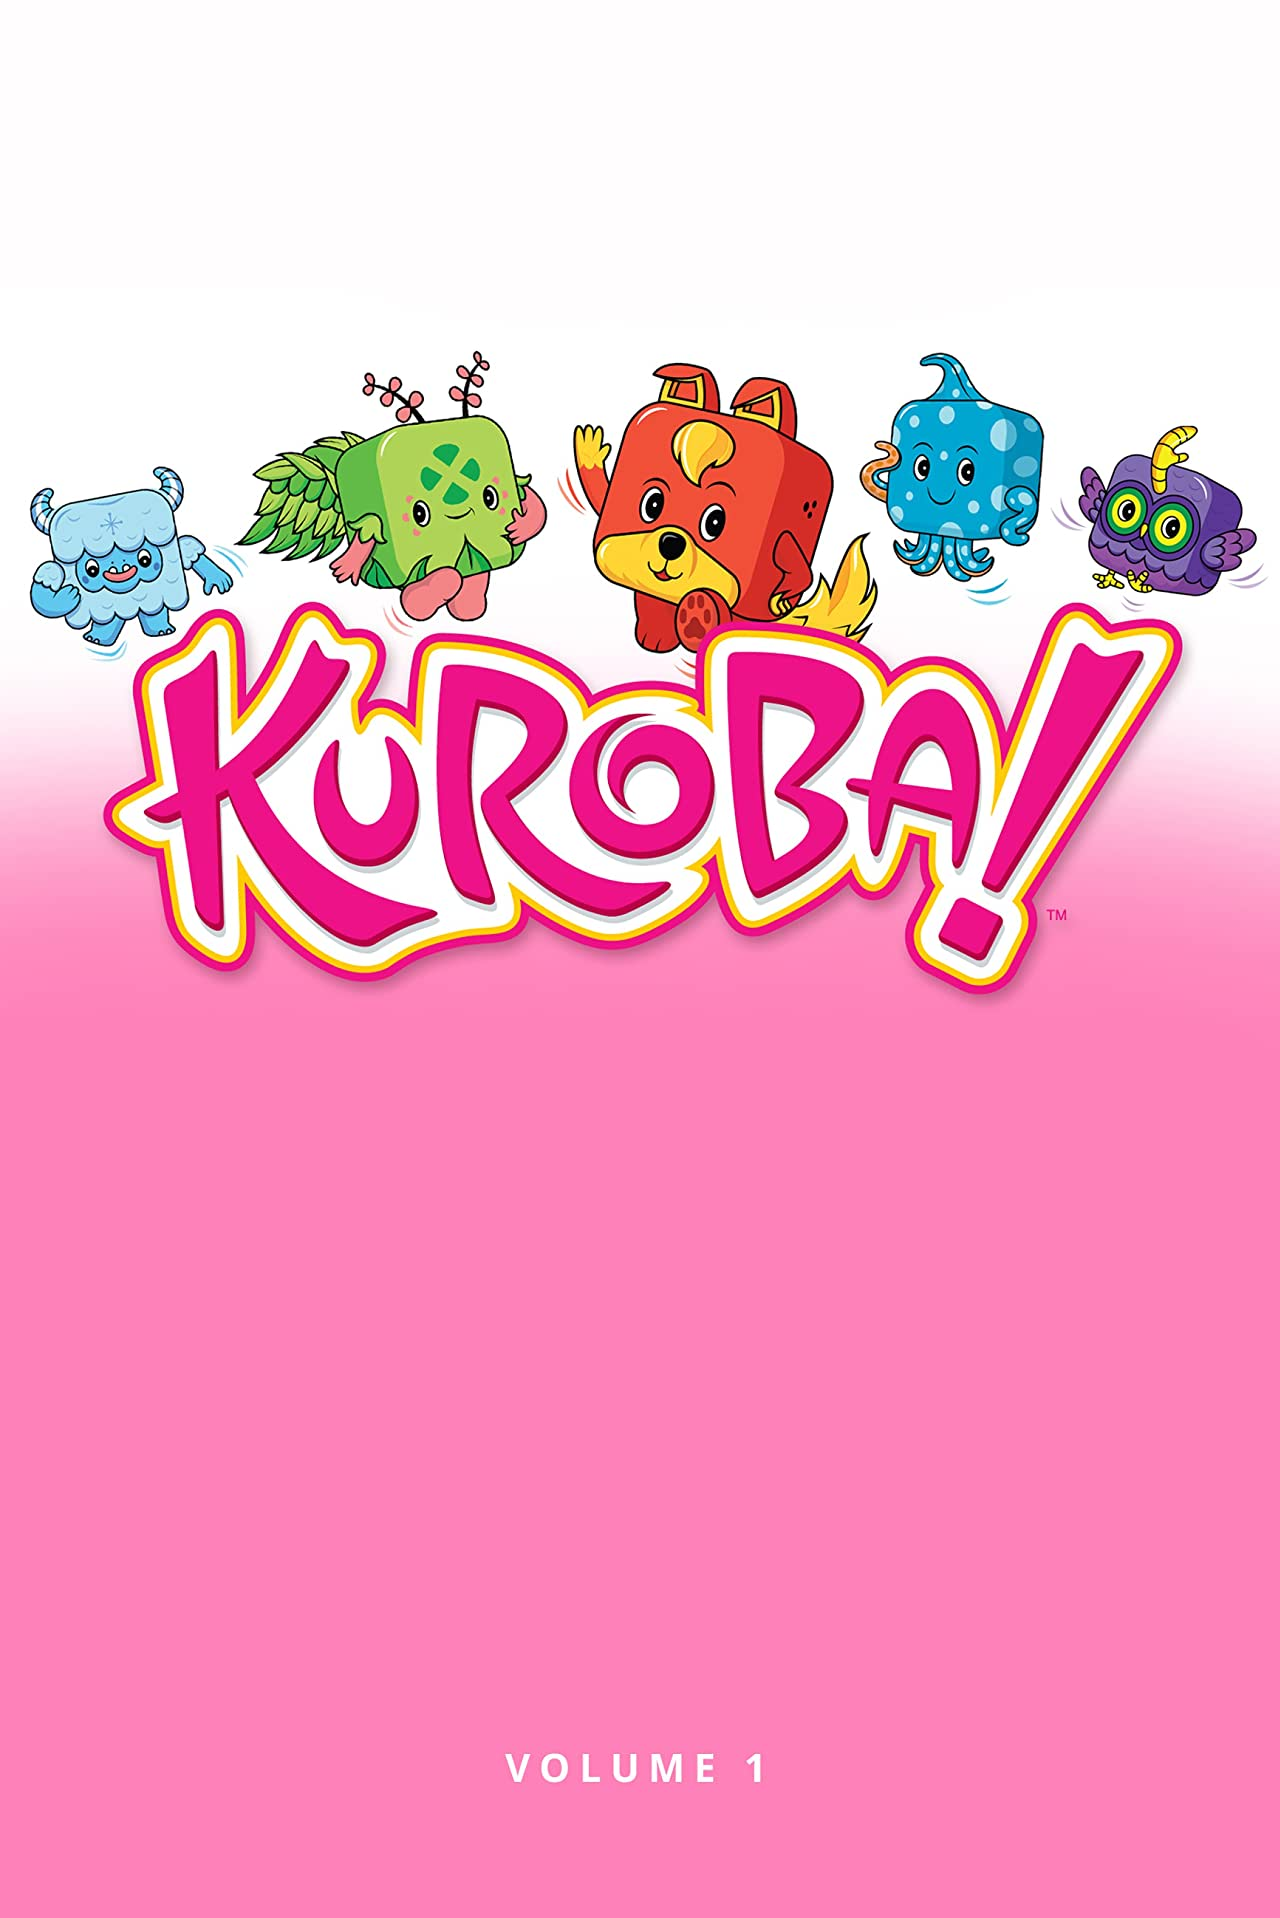 Kuroba Vol. 1